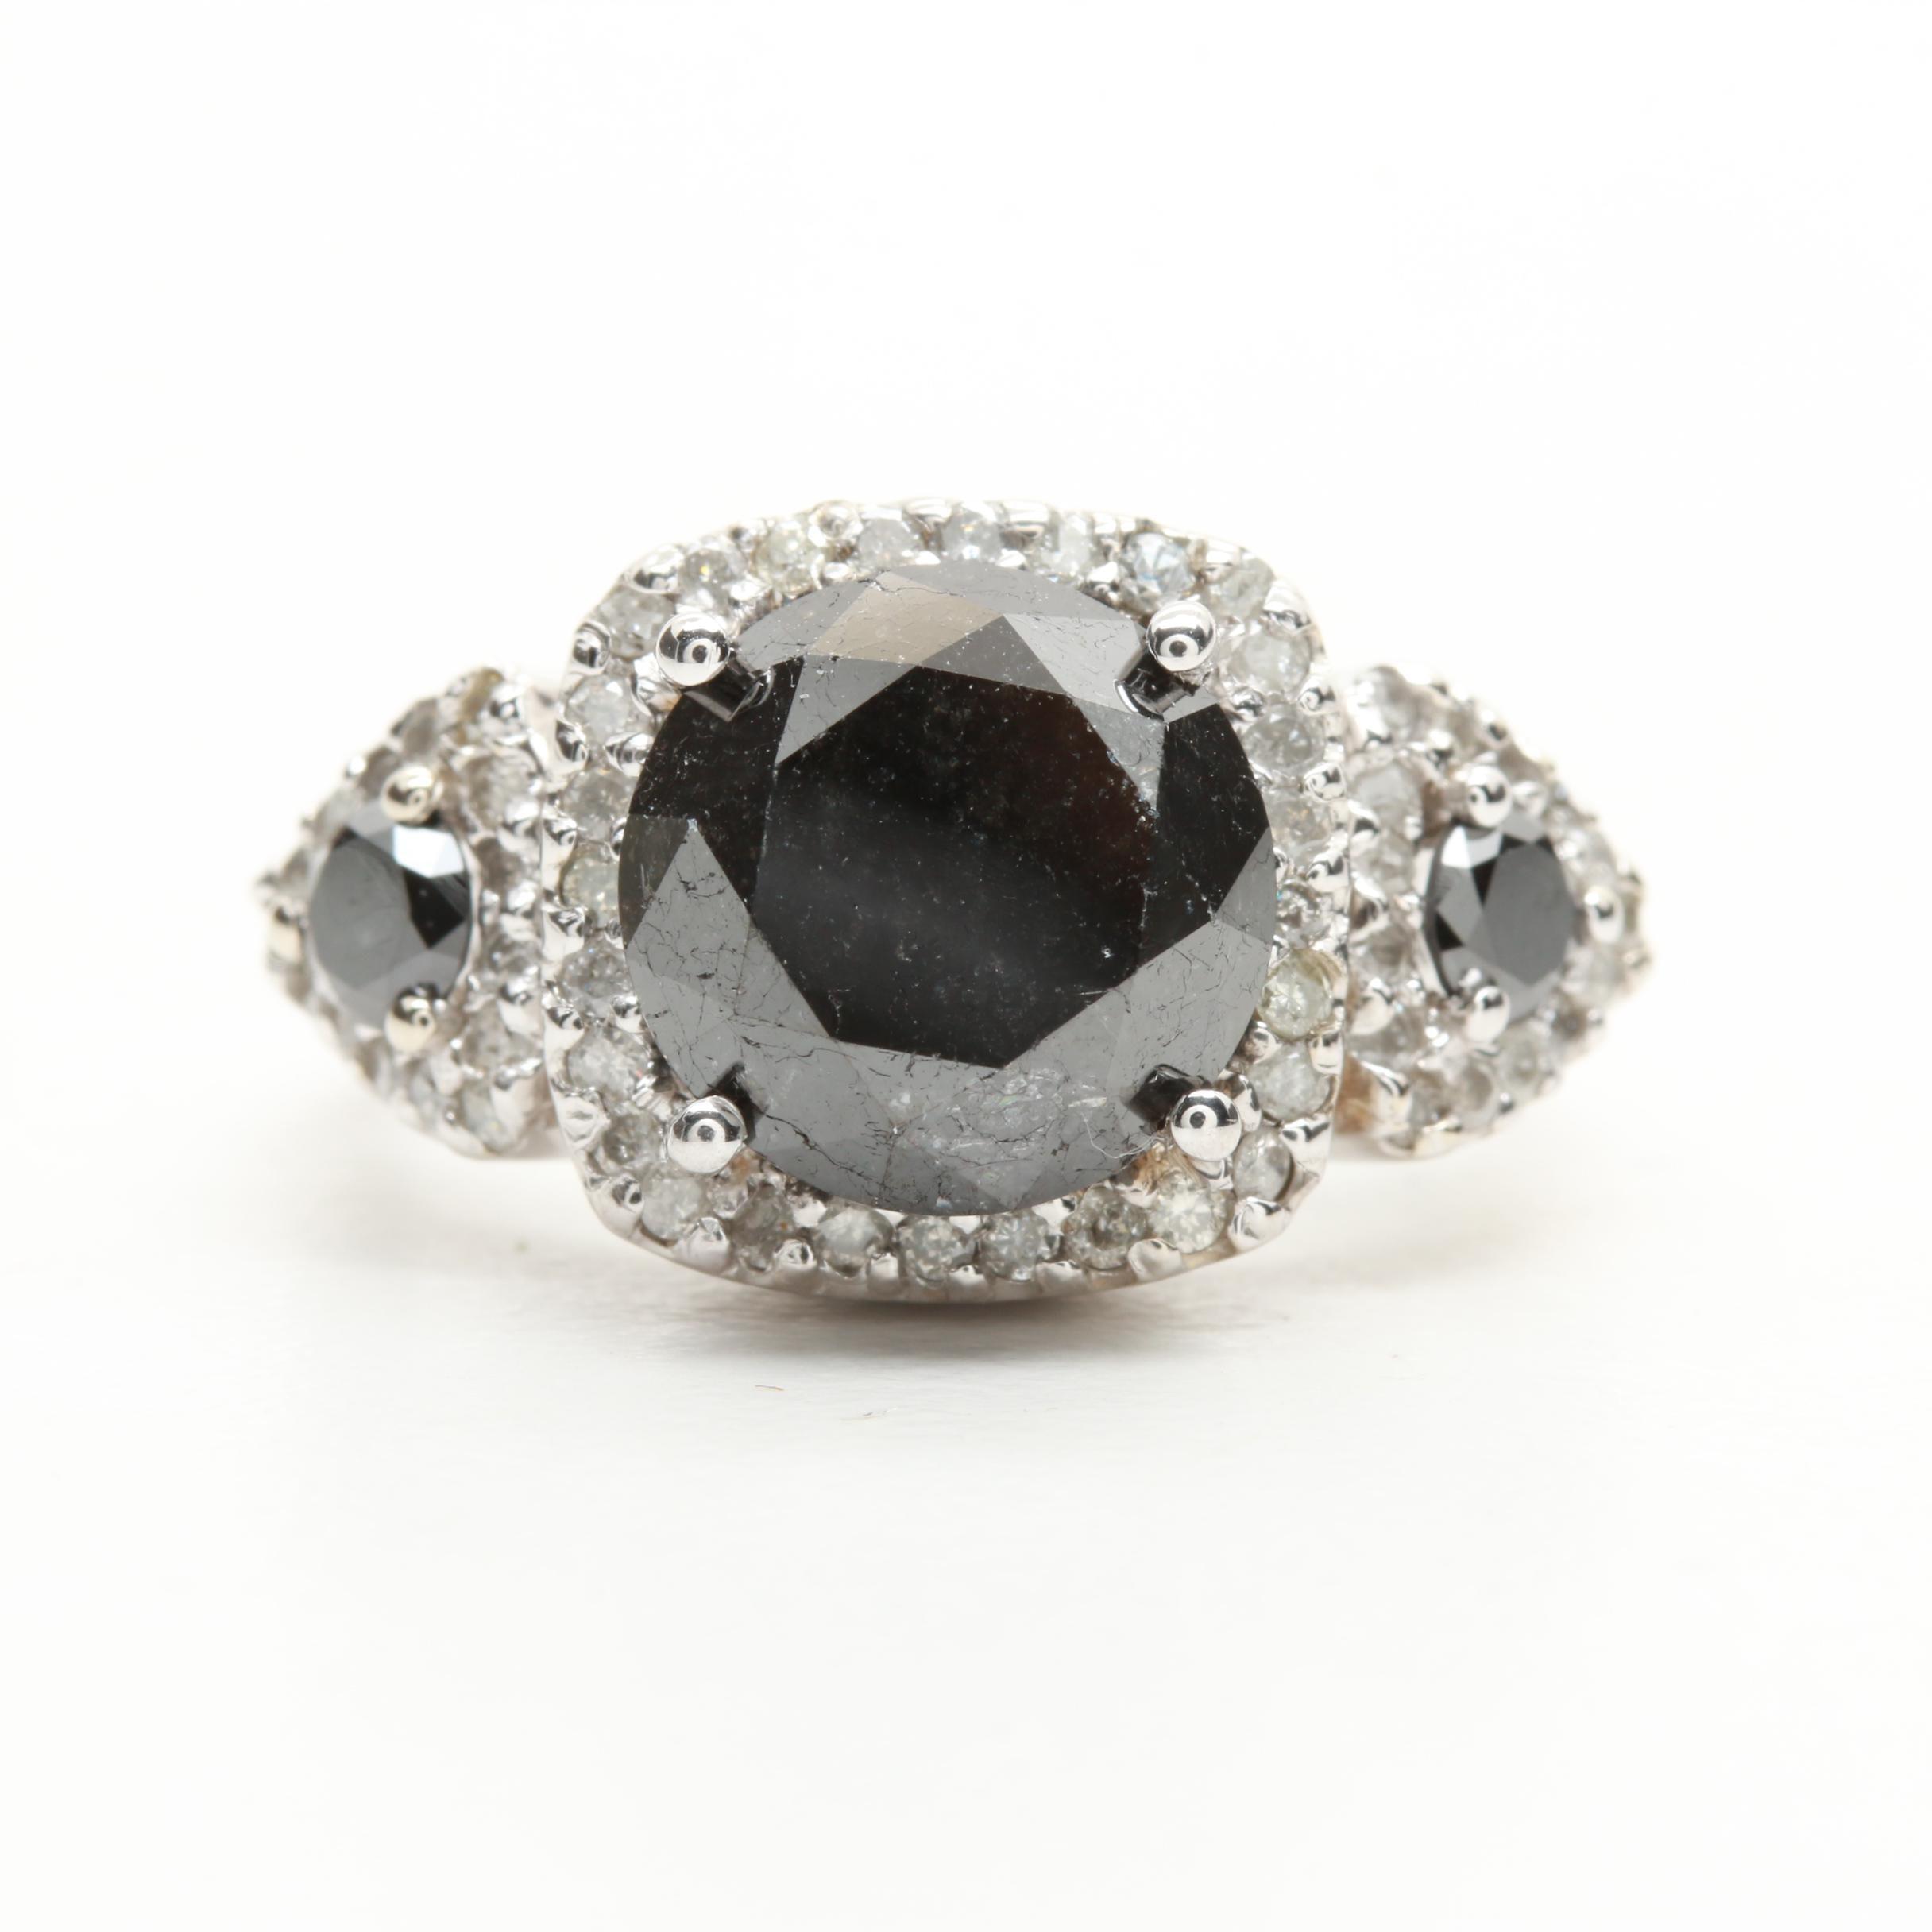 14K White Gold 6.20 CTW Diamond Ring Including Black Diamonds